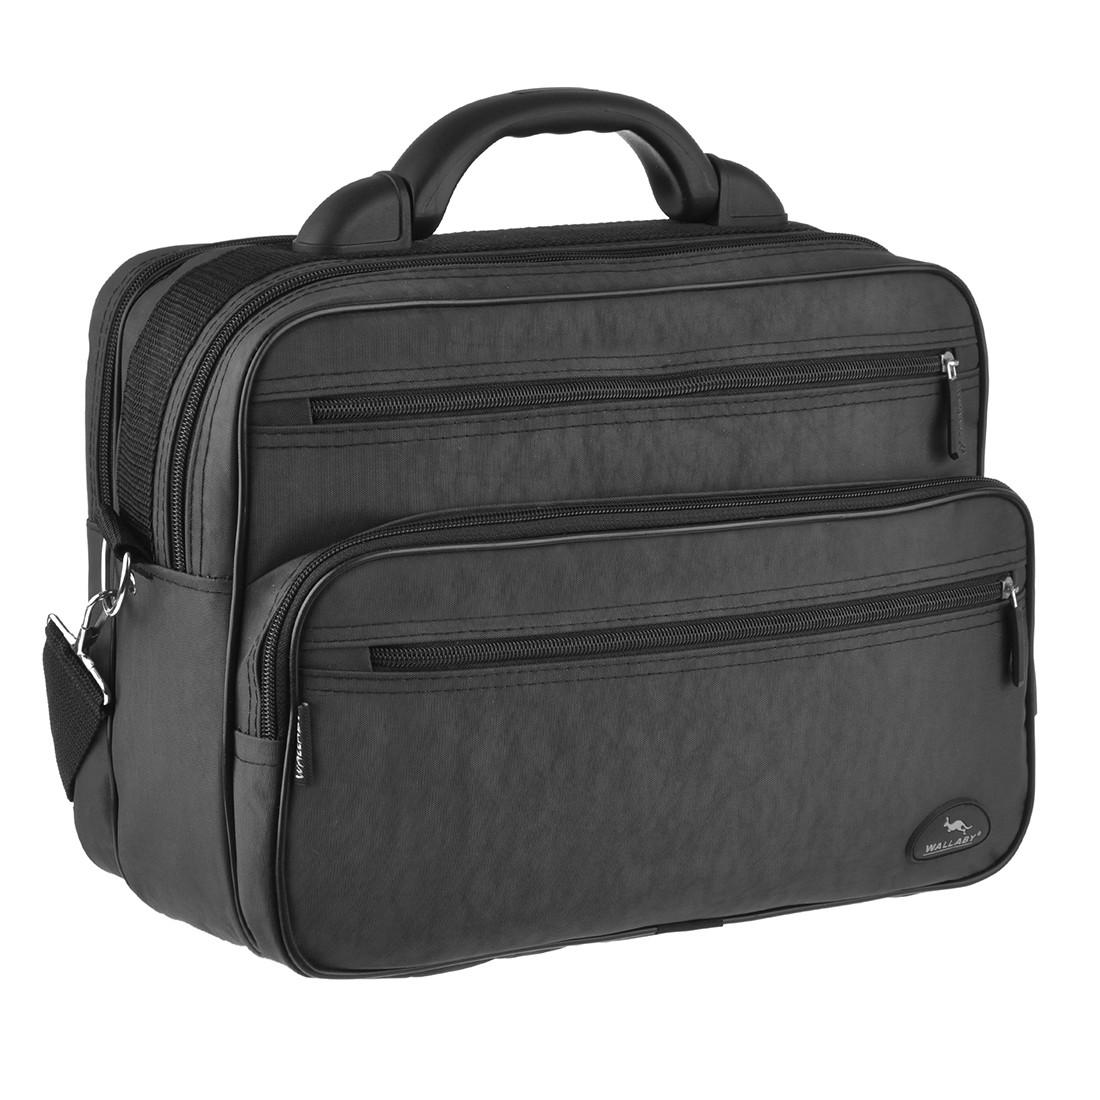 Мужская сумка Wallaby 36х26х16 ткань чёрный кринкл, ручка пластиковая  в 2653ч